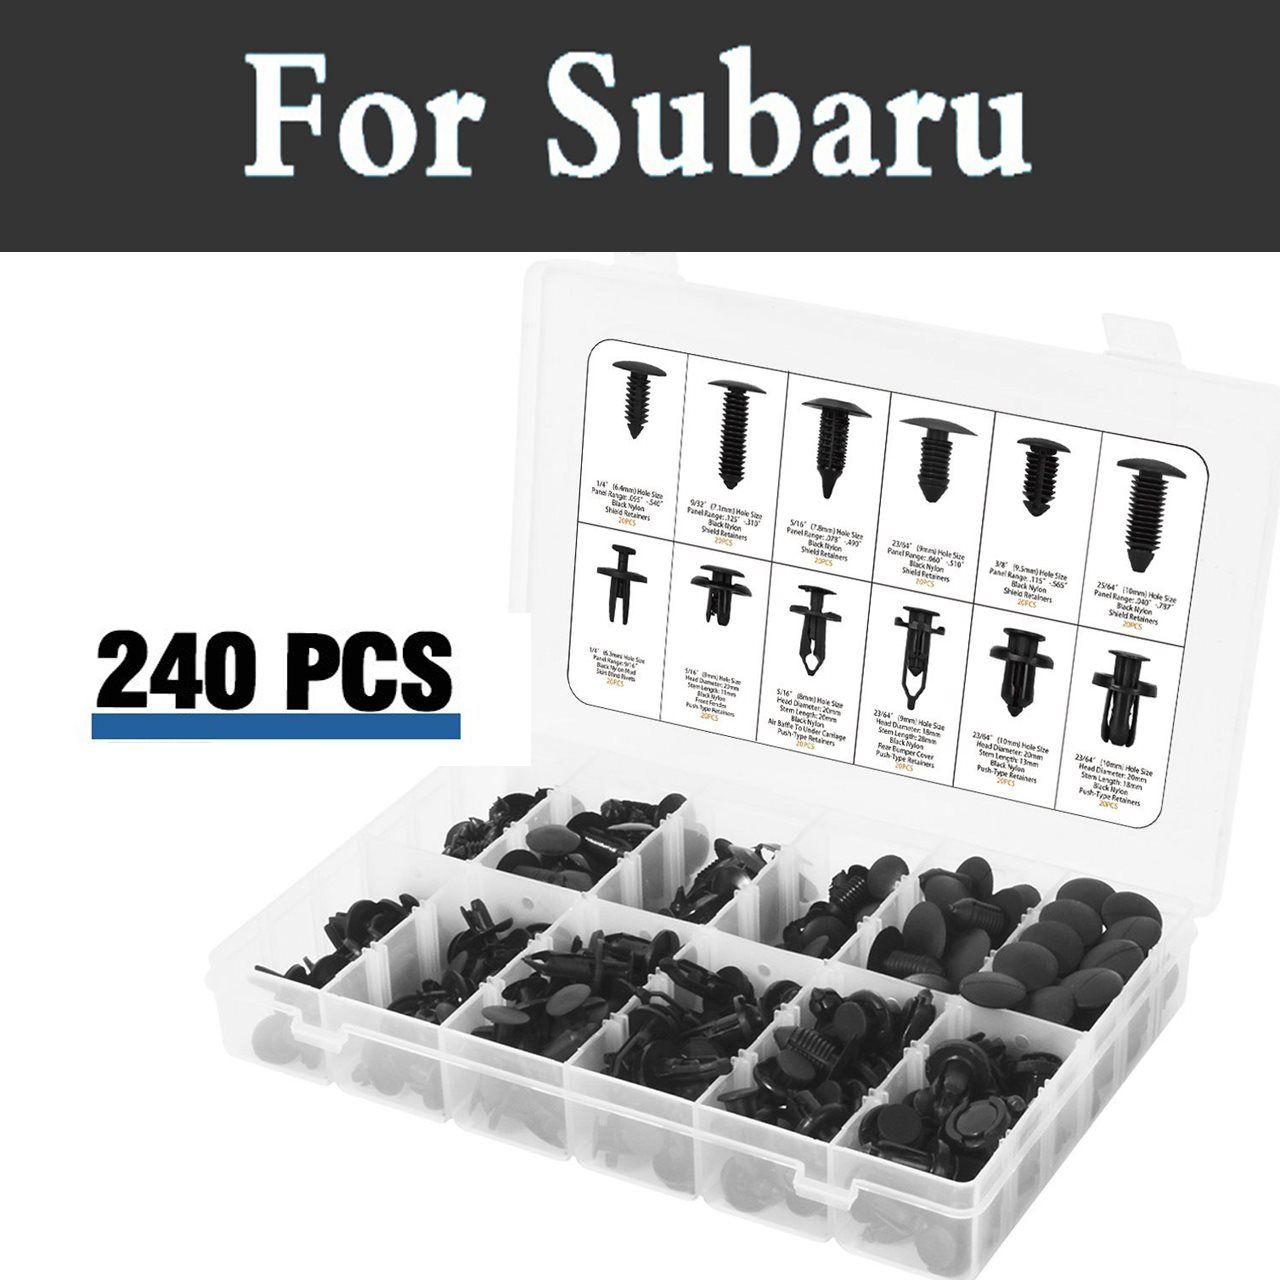 240pcs Plastic Car Retainers Trim Mud Guard Trim Push Car Rivets For Subaru Alcyone Brz Dex Forester Impreza Wrx Sti Justy